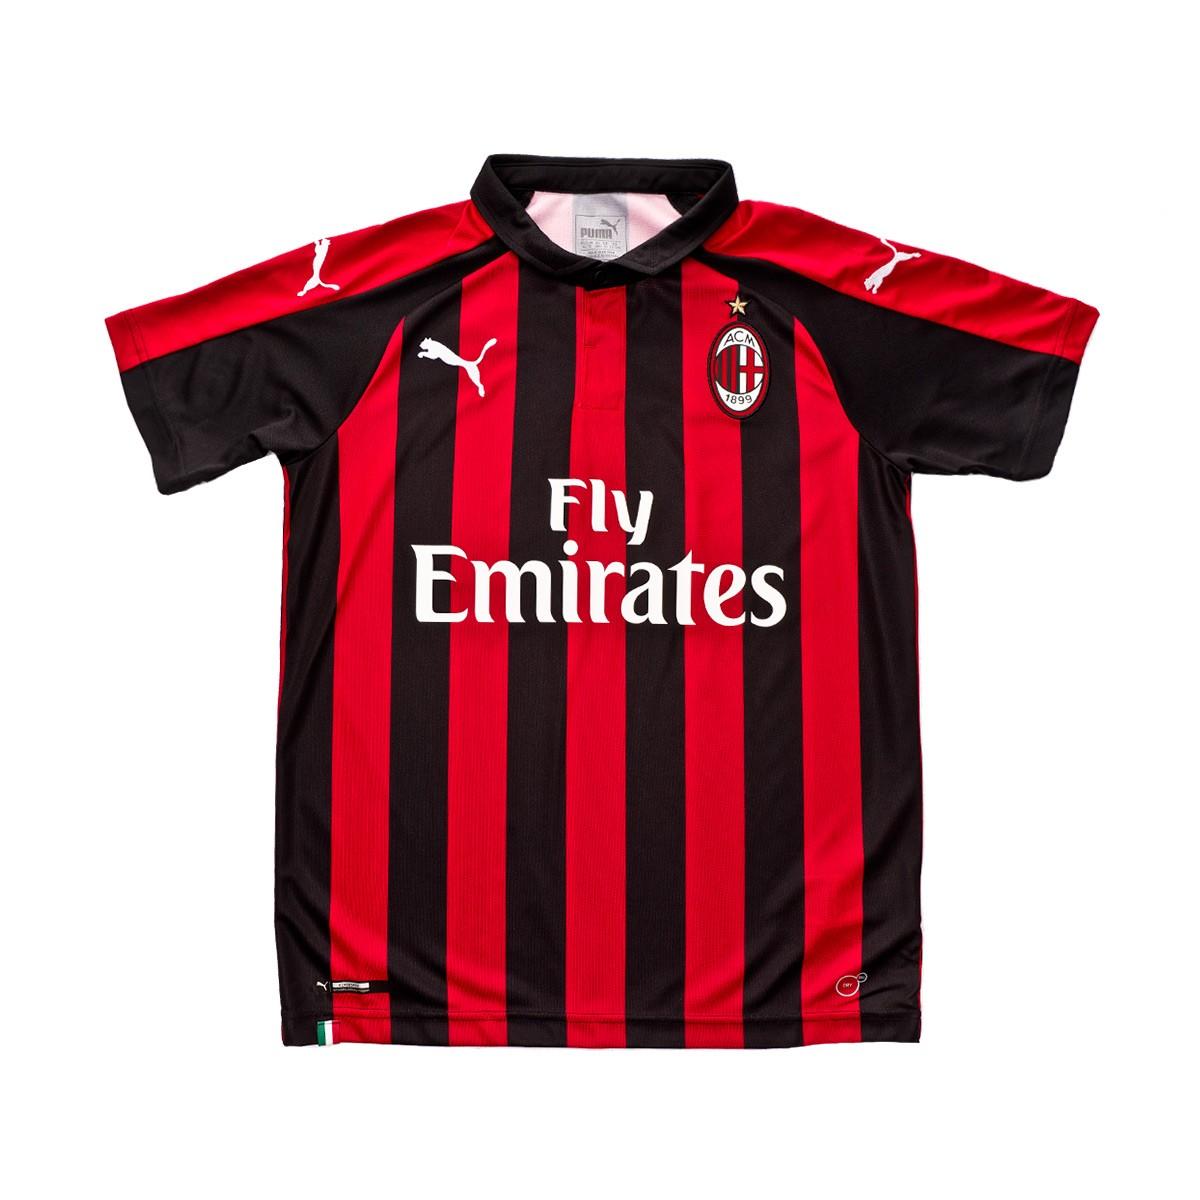 Camiseta Puma AC Milan Primera Equipación 2018-2019 Niño Chili ... b08053d2d285a